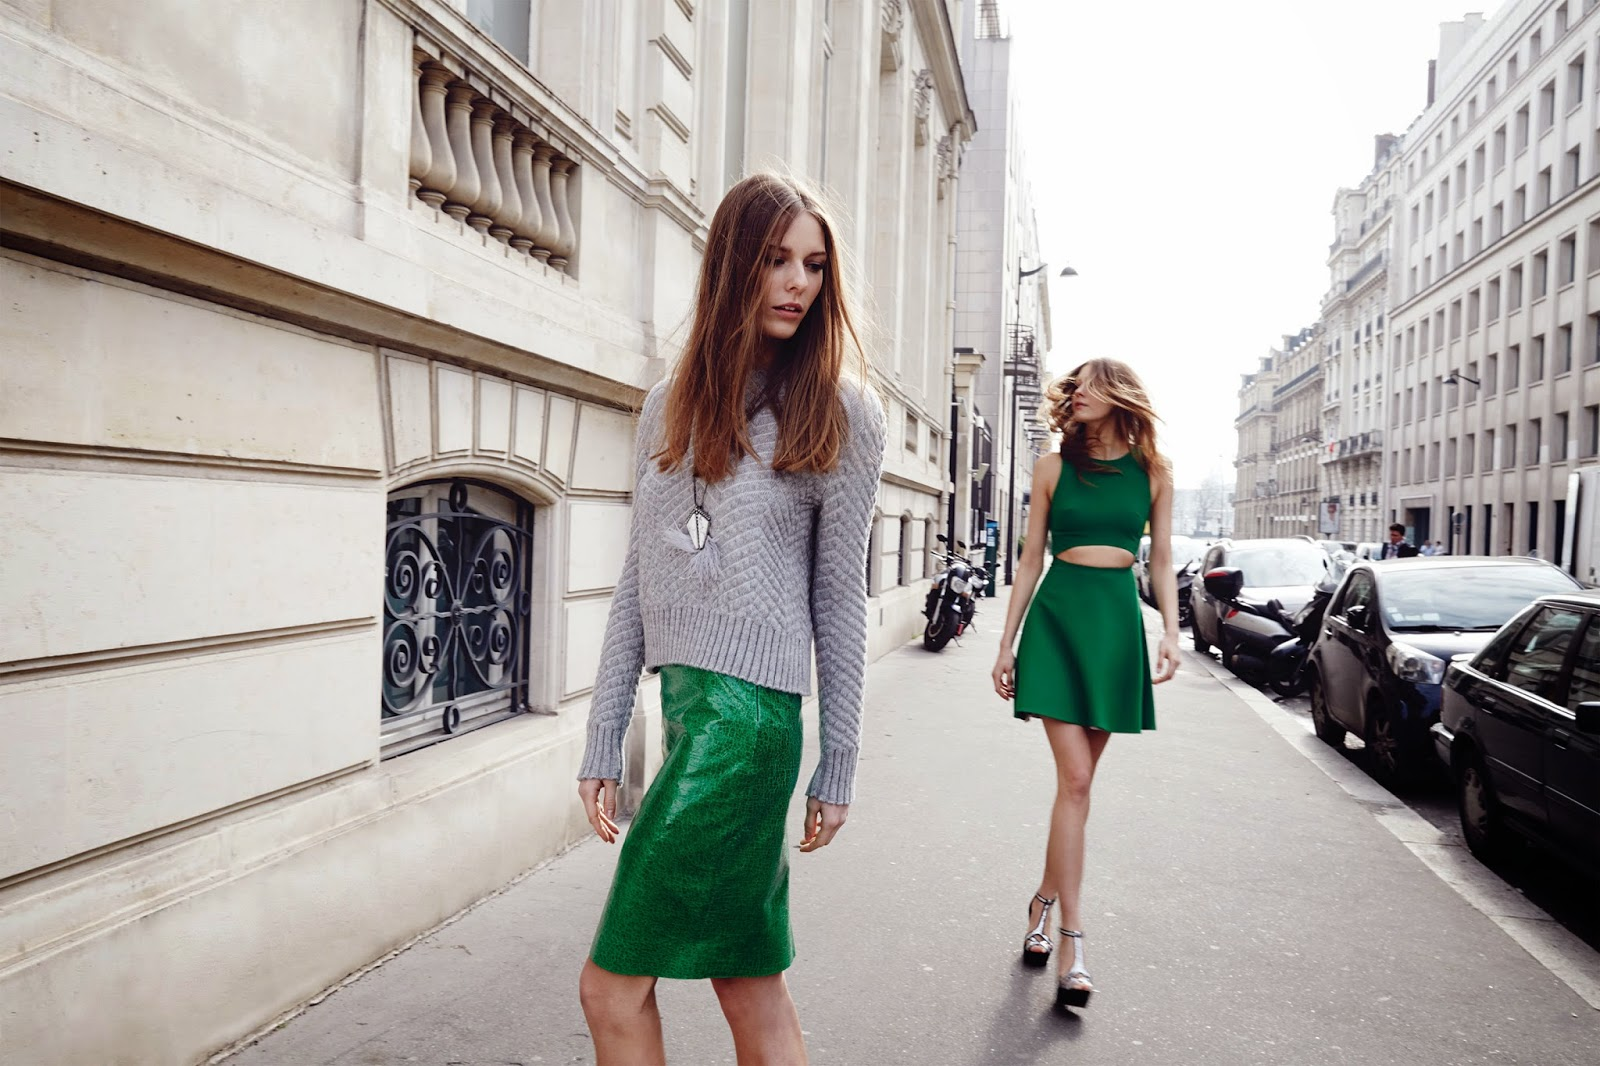 69bd075bb1152 Blog Fashionista Baiana I Bell Pimentel  NK Store Inverno 2015